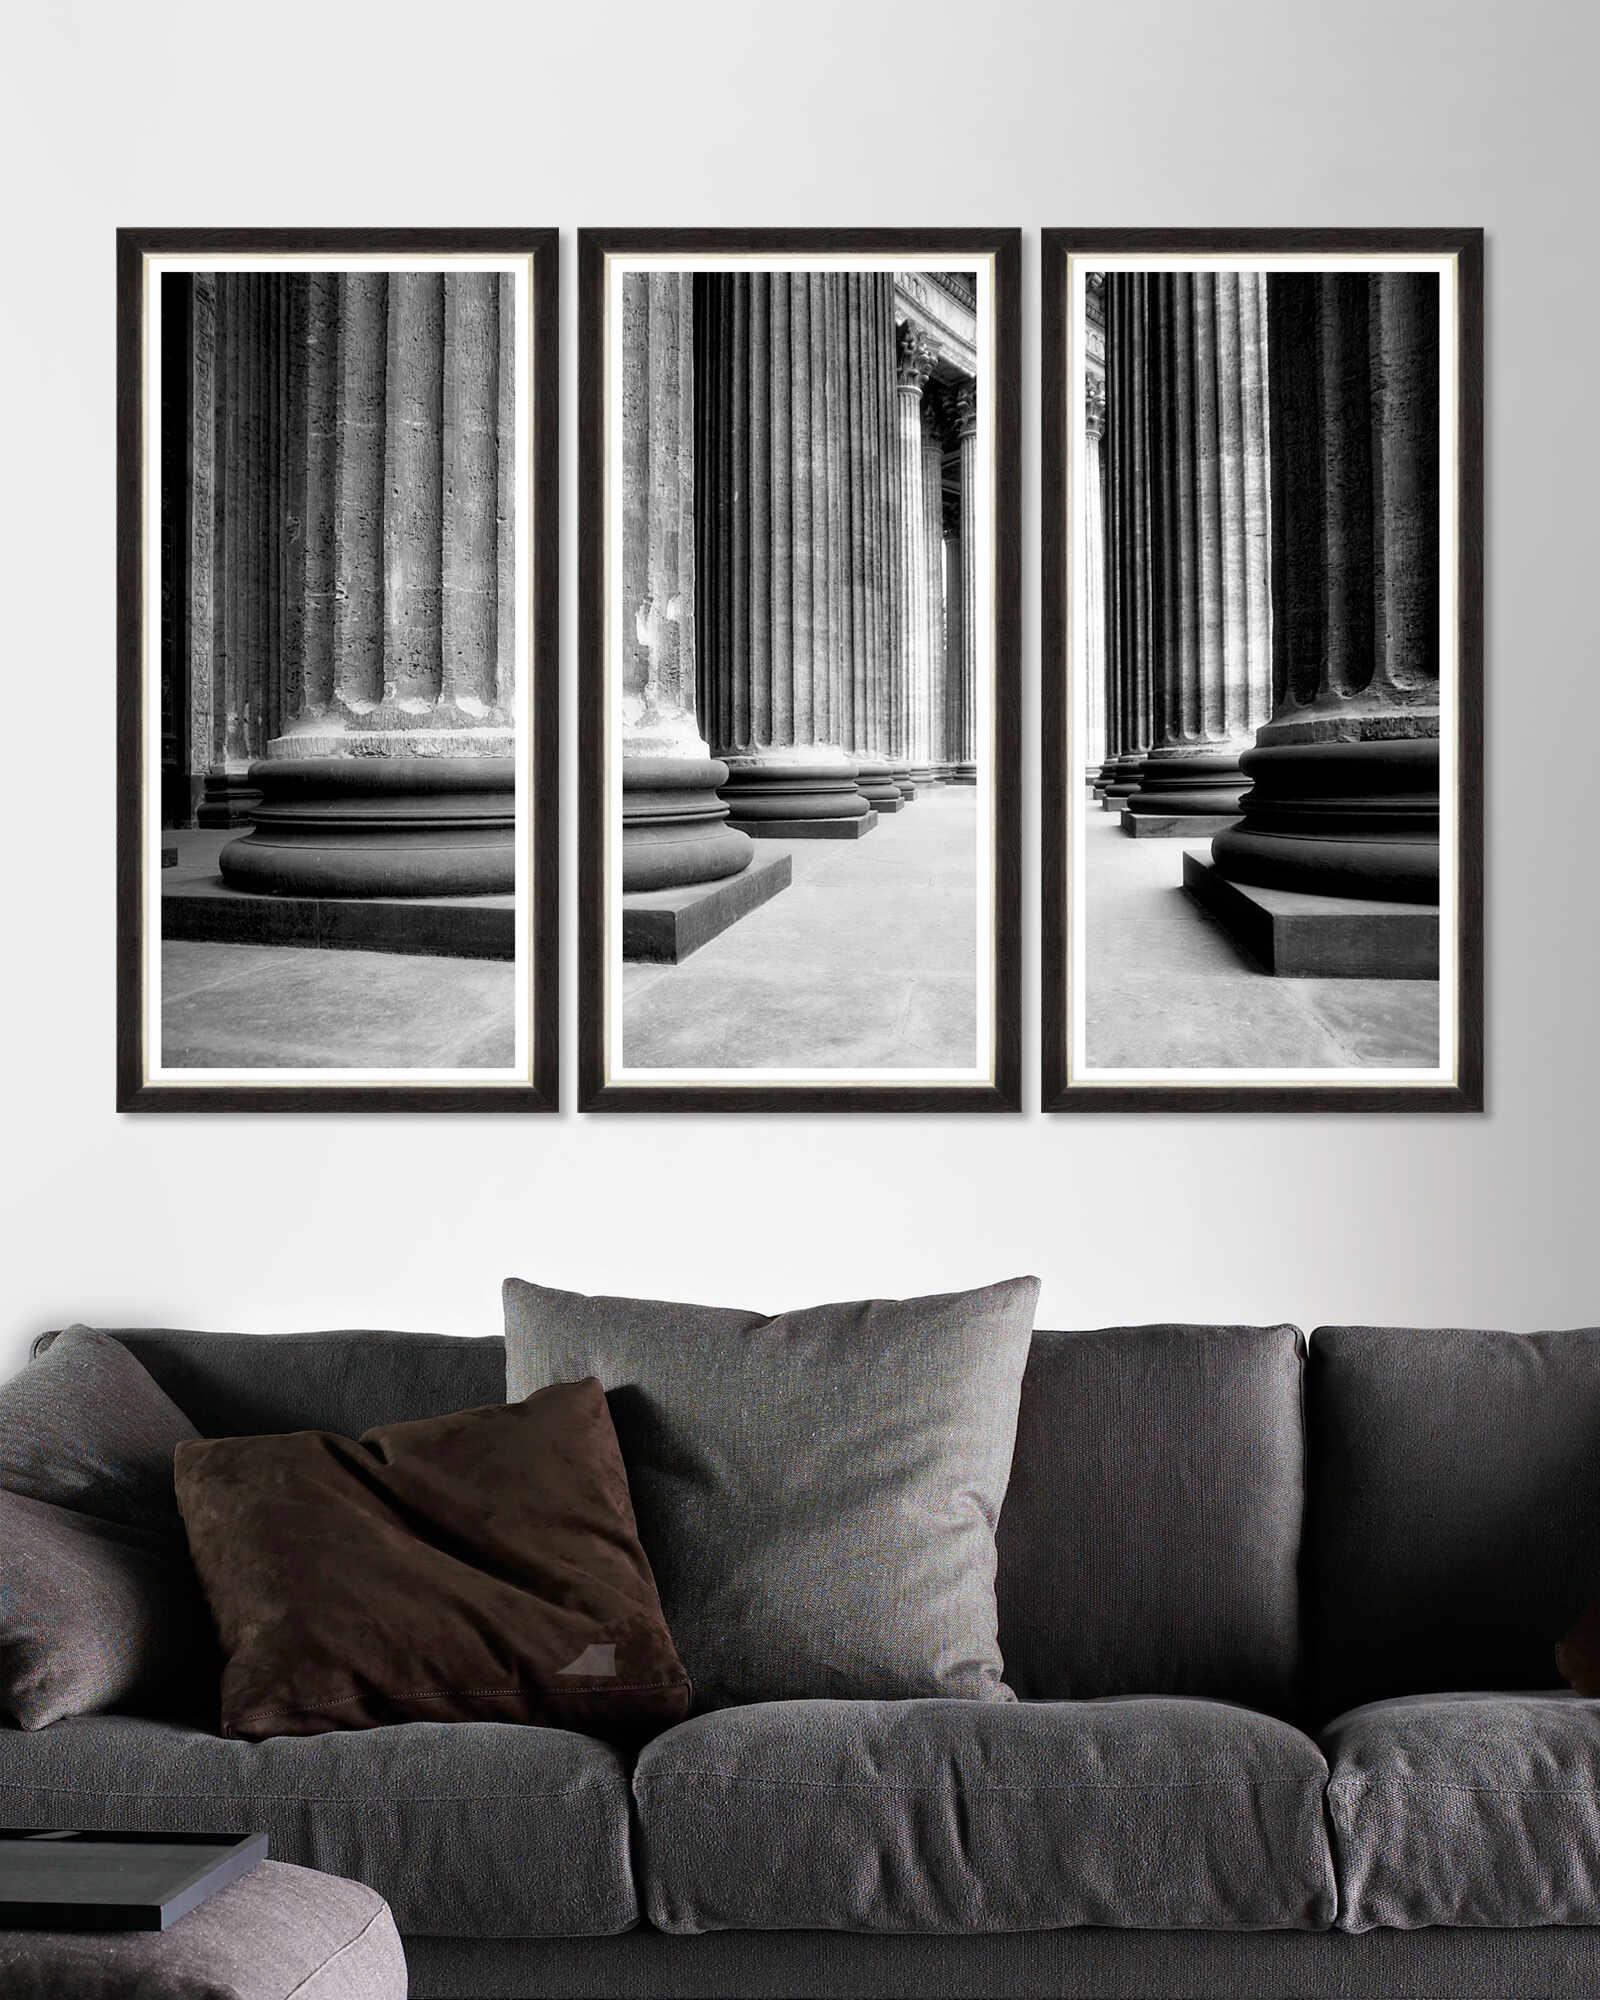 Tablou 3 piese Framed Art Church Colonnade Triptych la pret 740 lei